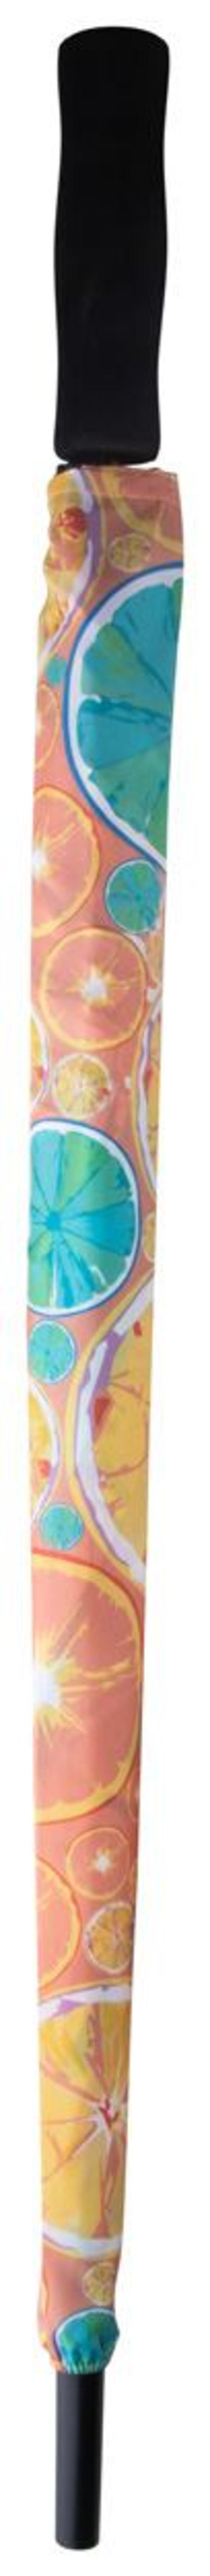 Slumber custom umbrella pouch